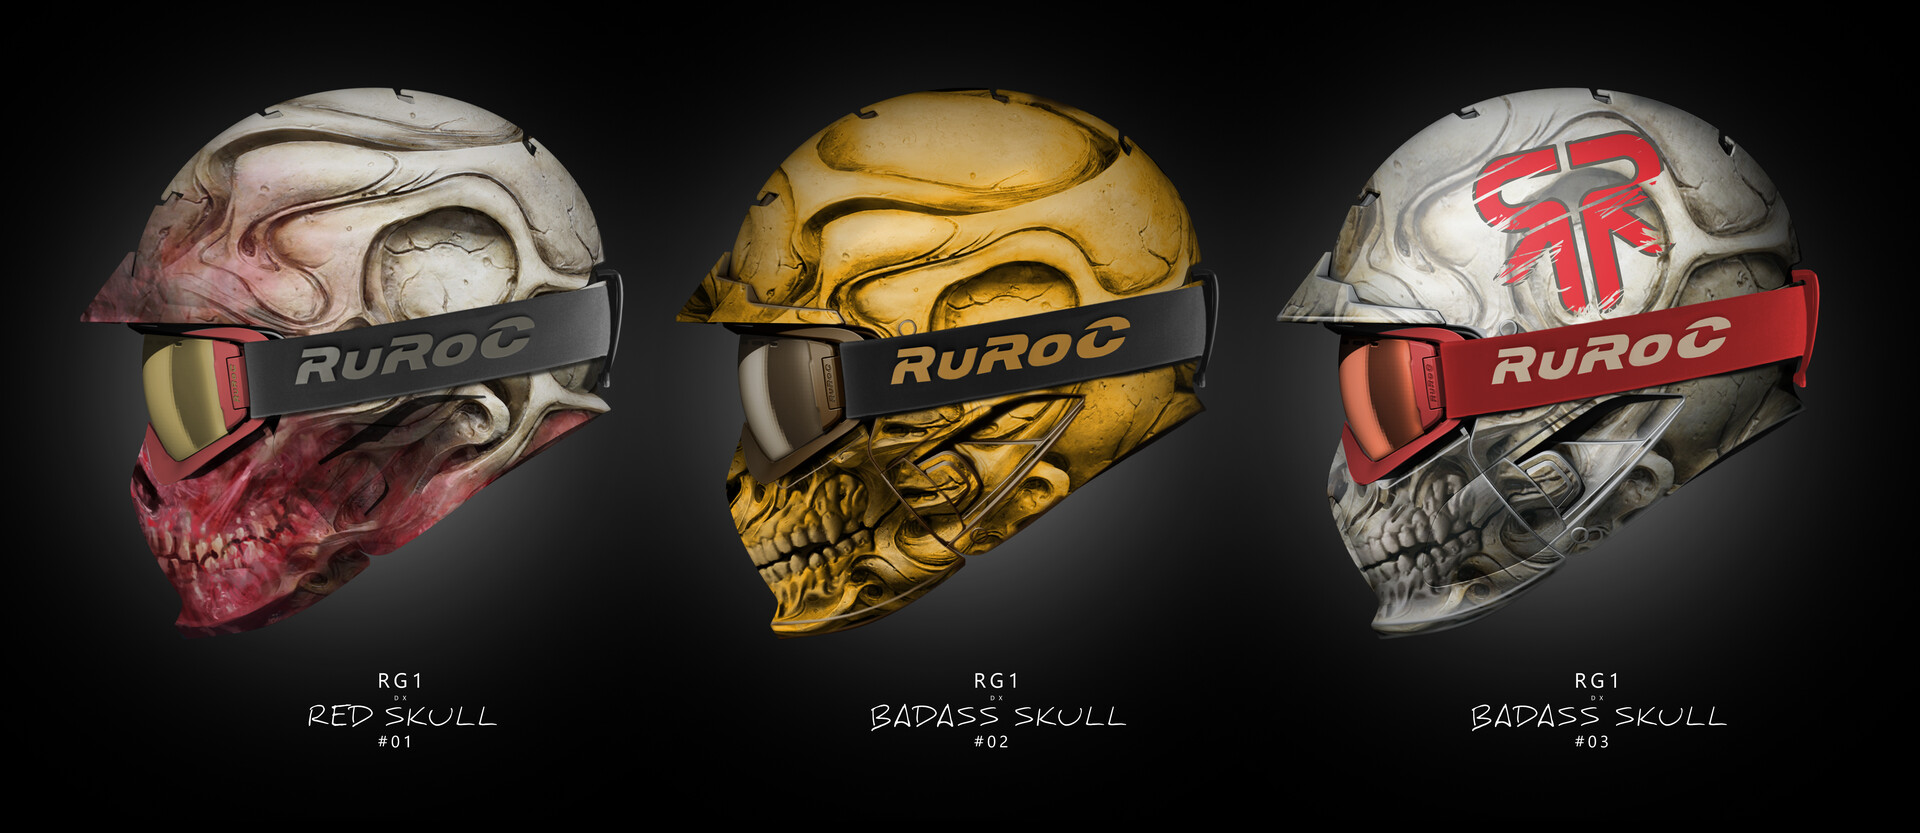 Pablo olivera ruroc bx ass skull 2